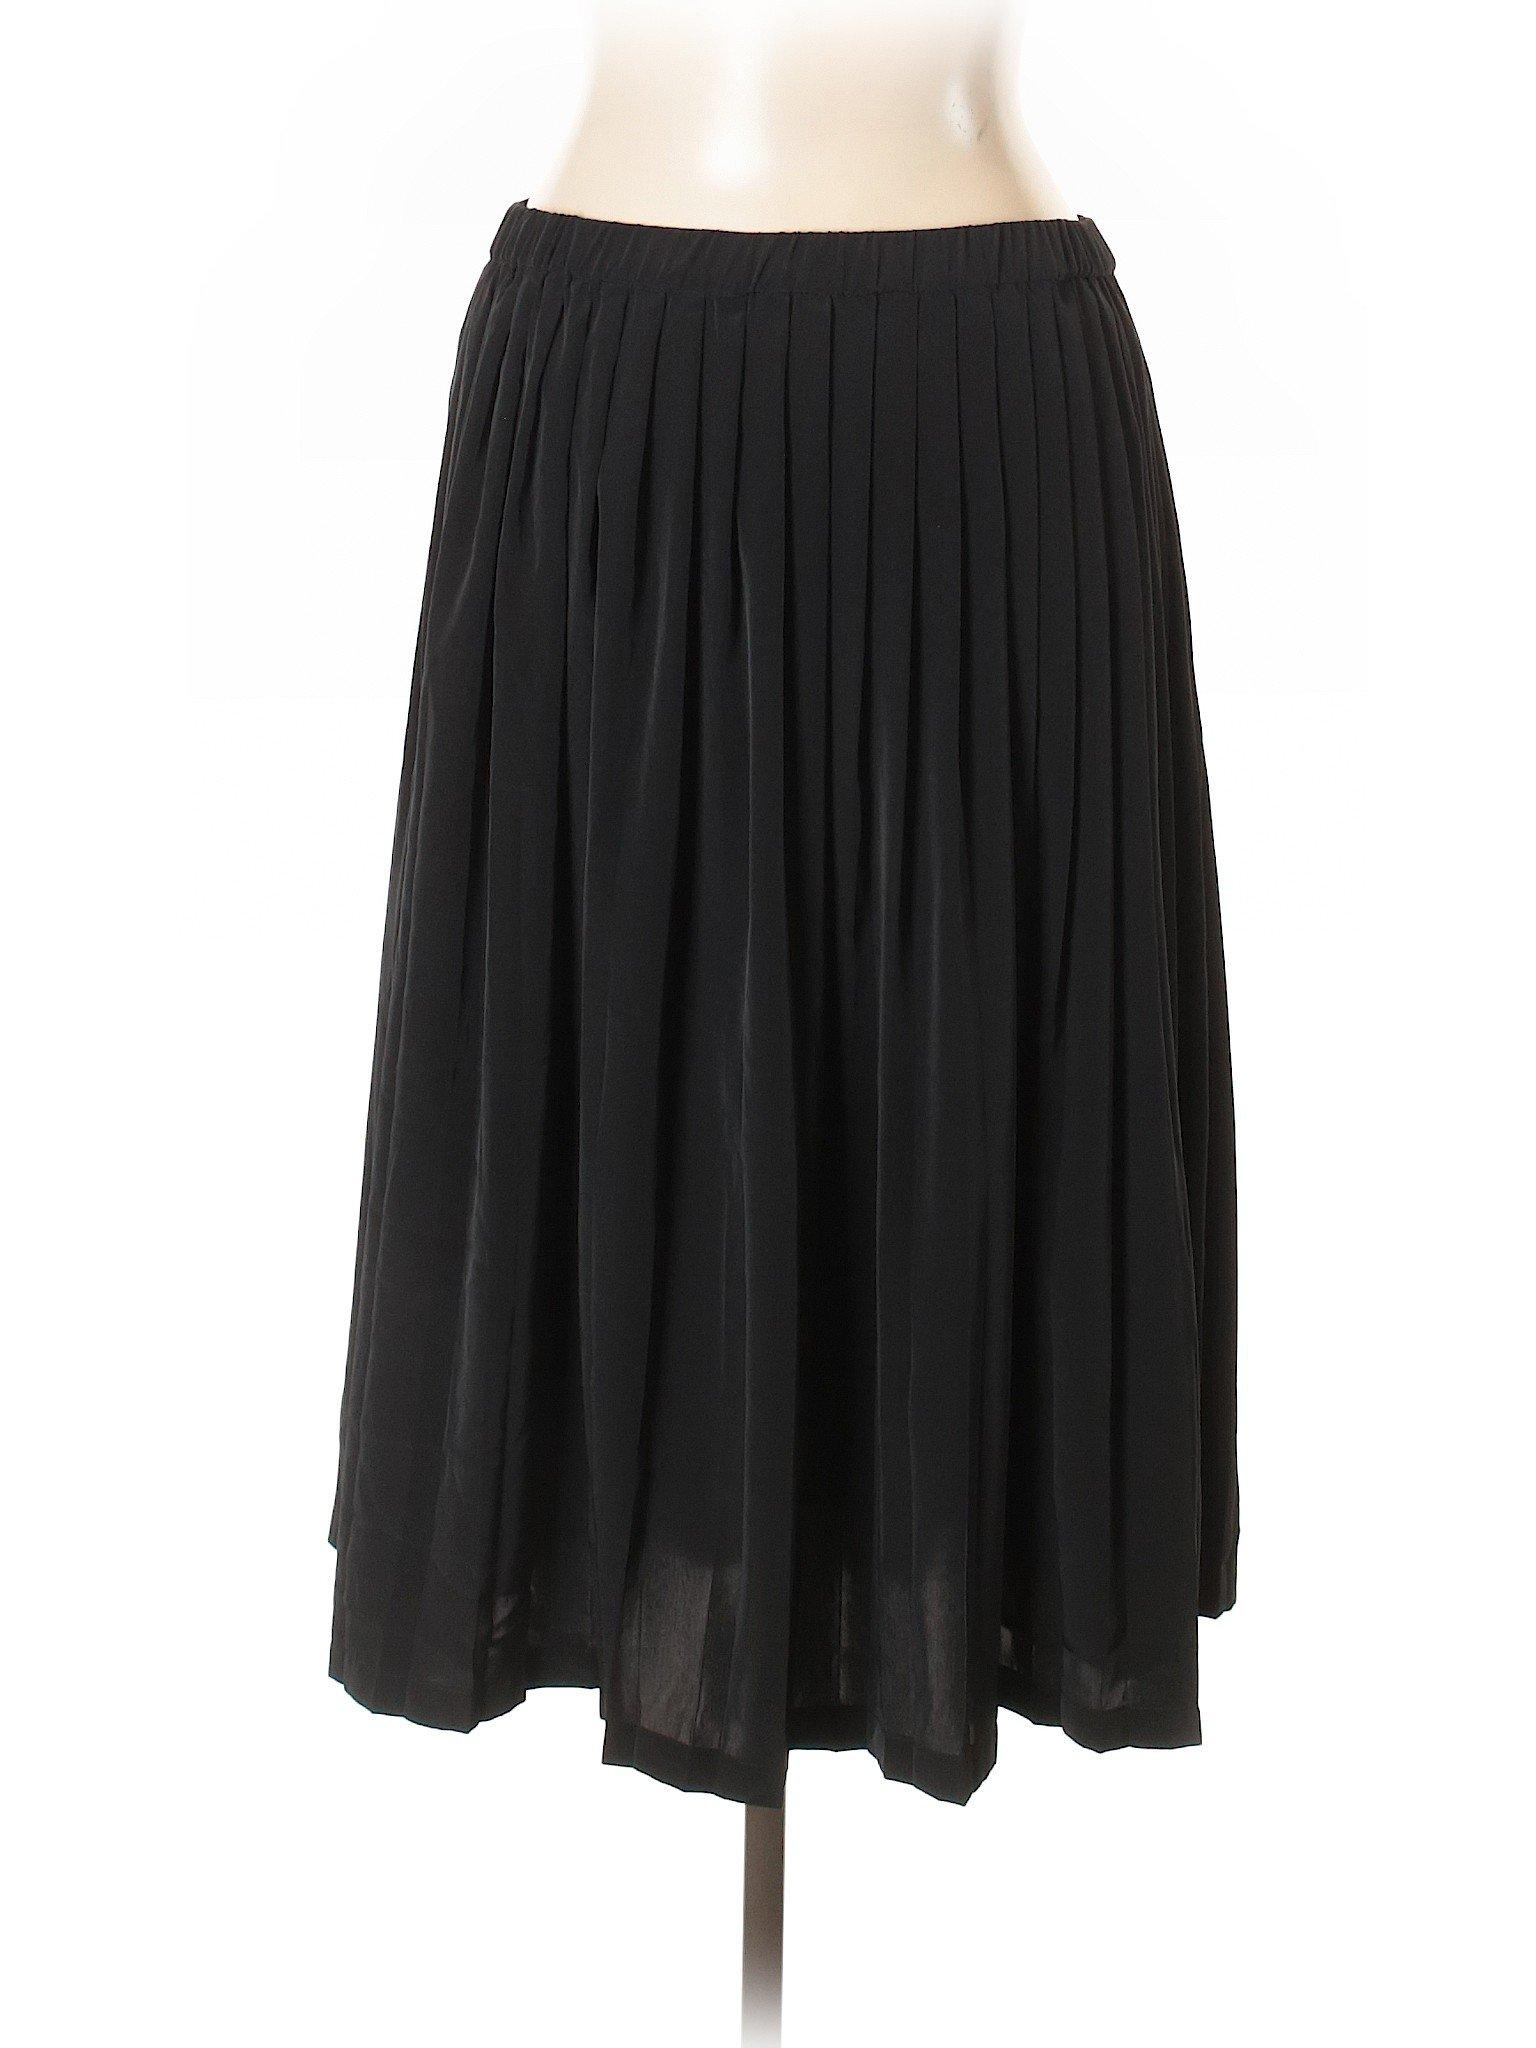 Boutique Skirt Casual Casual Boutique O4fvxxqUIw